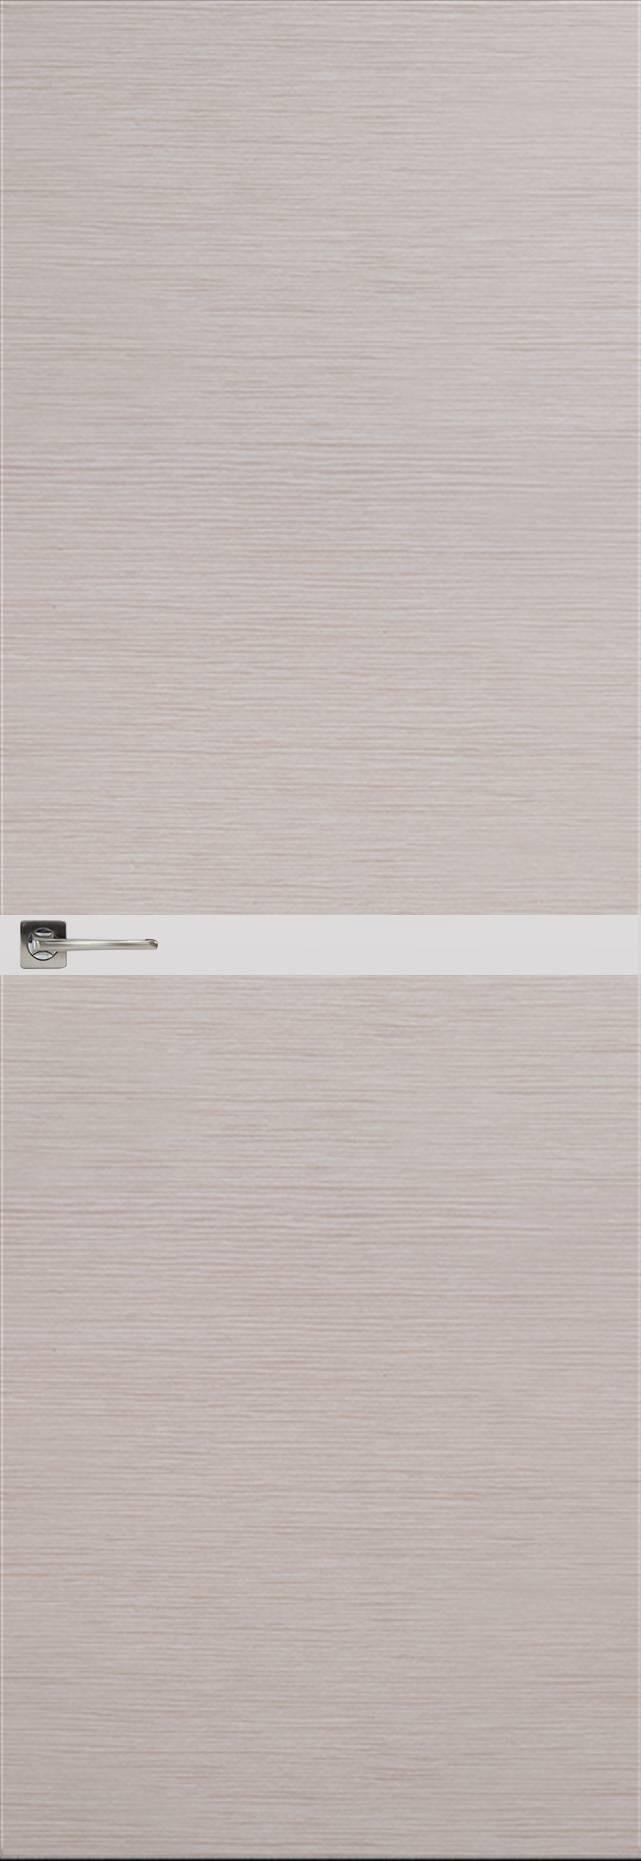 Tivoli Б-4 Невидимка цвет - Дымчатый дуб Без стекла (ДГ)